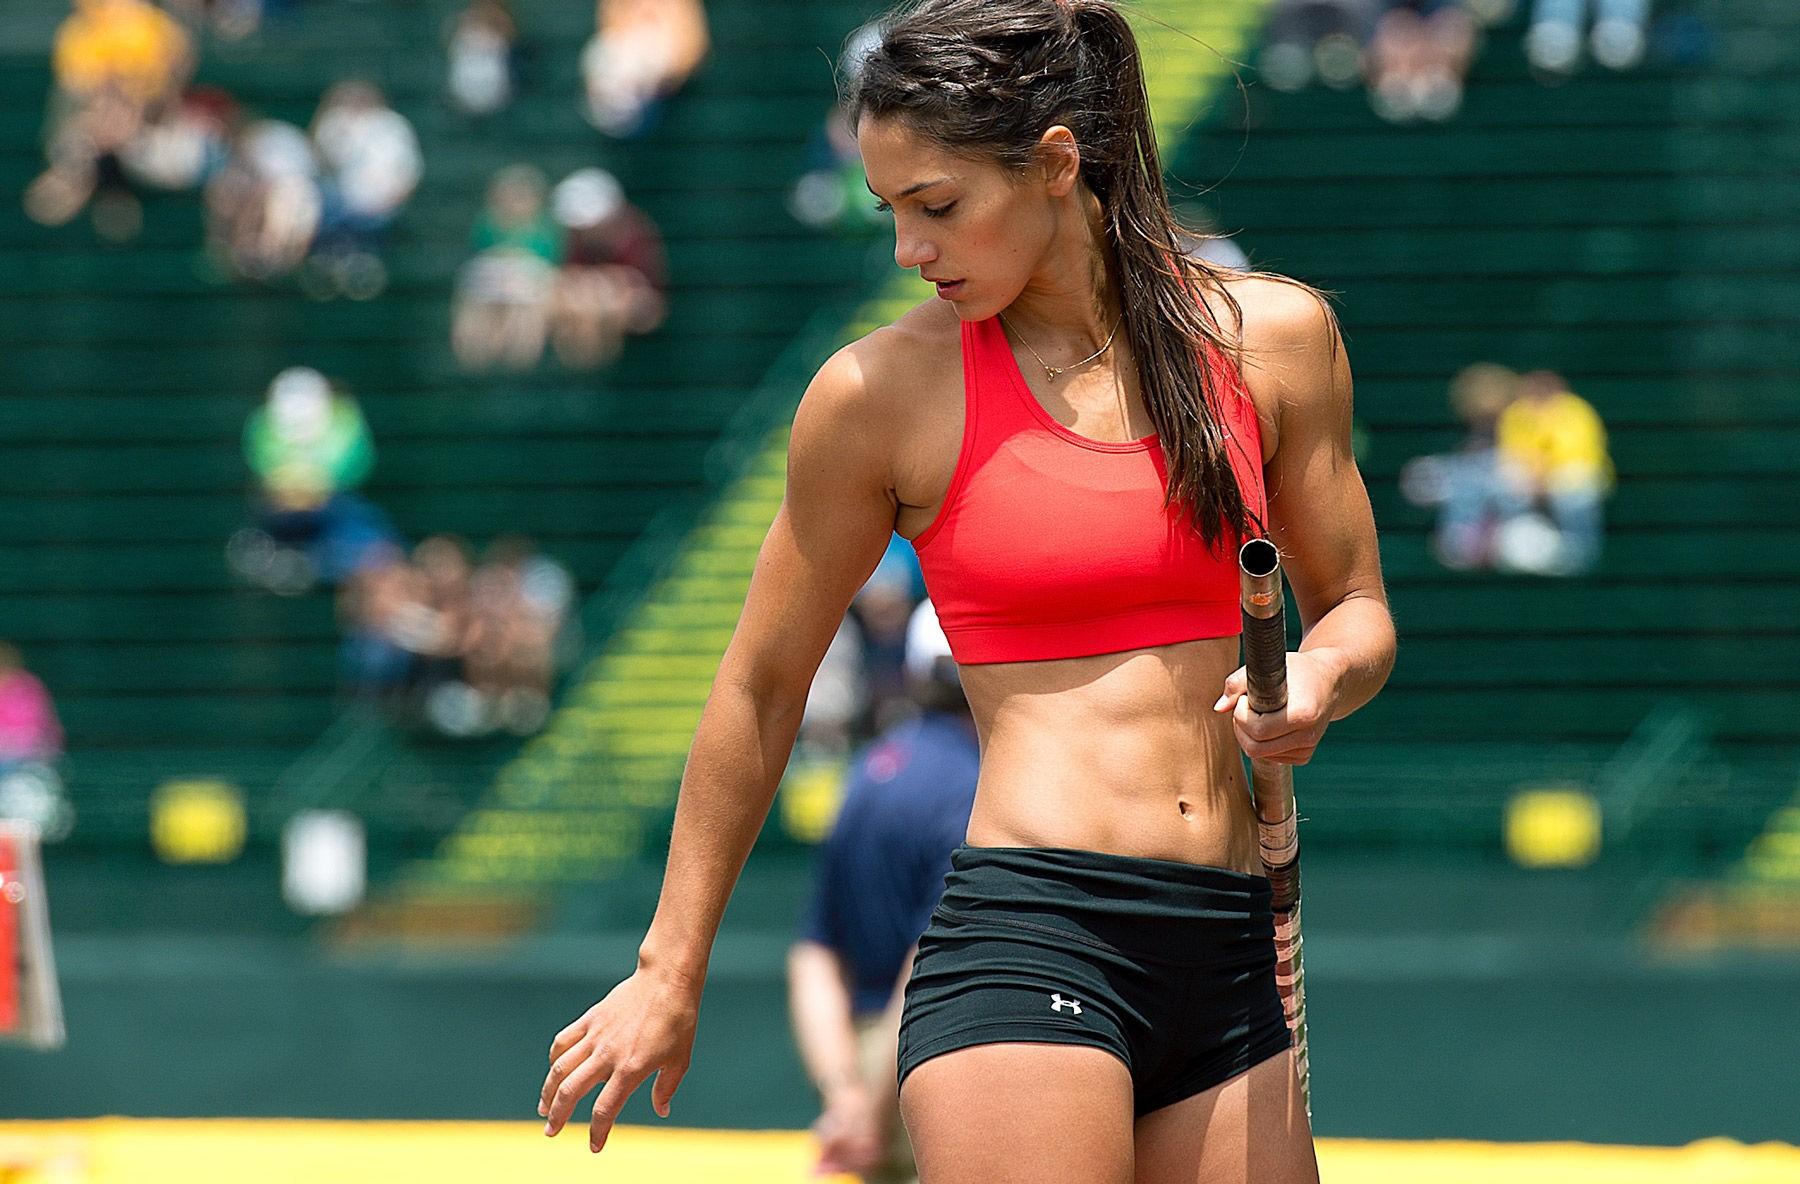 Спортсменка девочка картинки